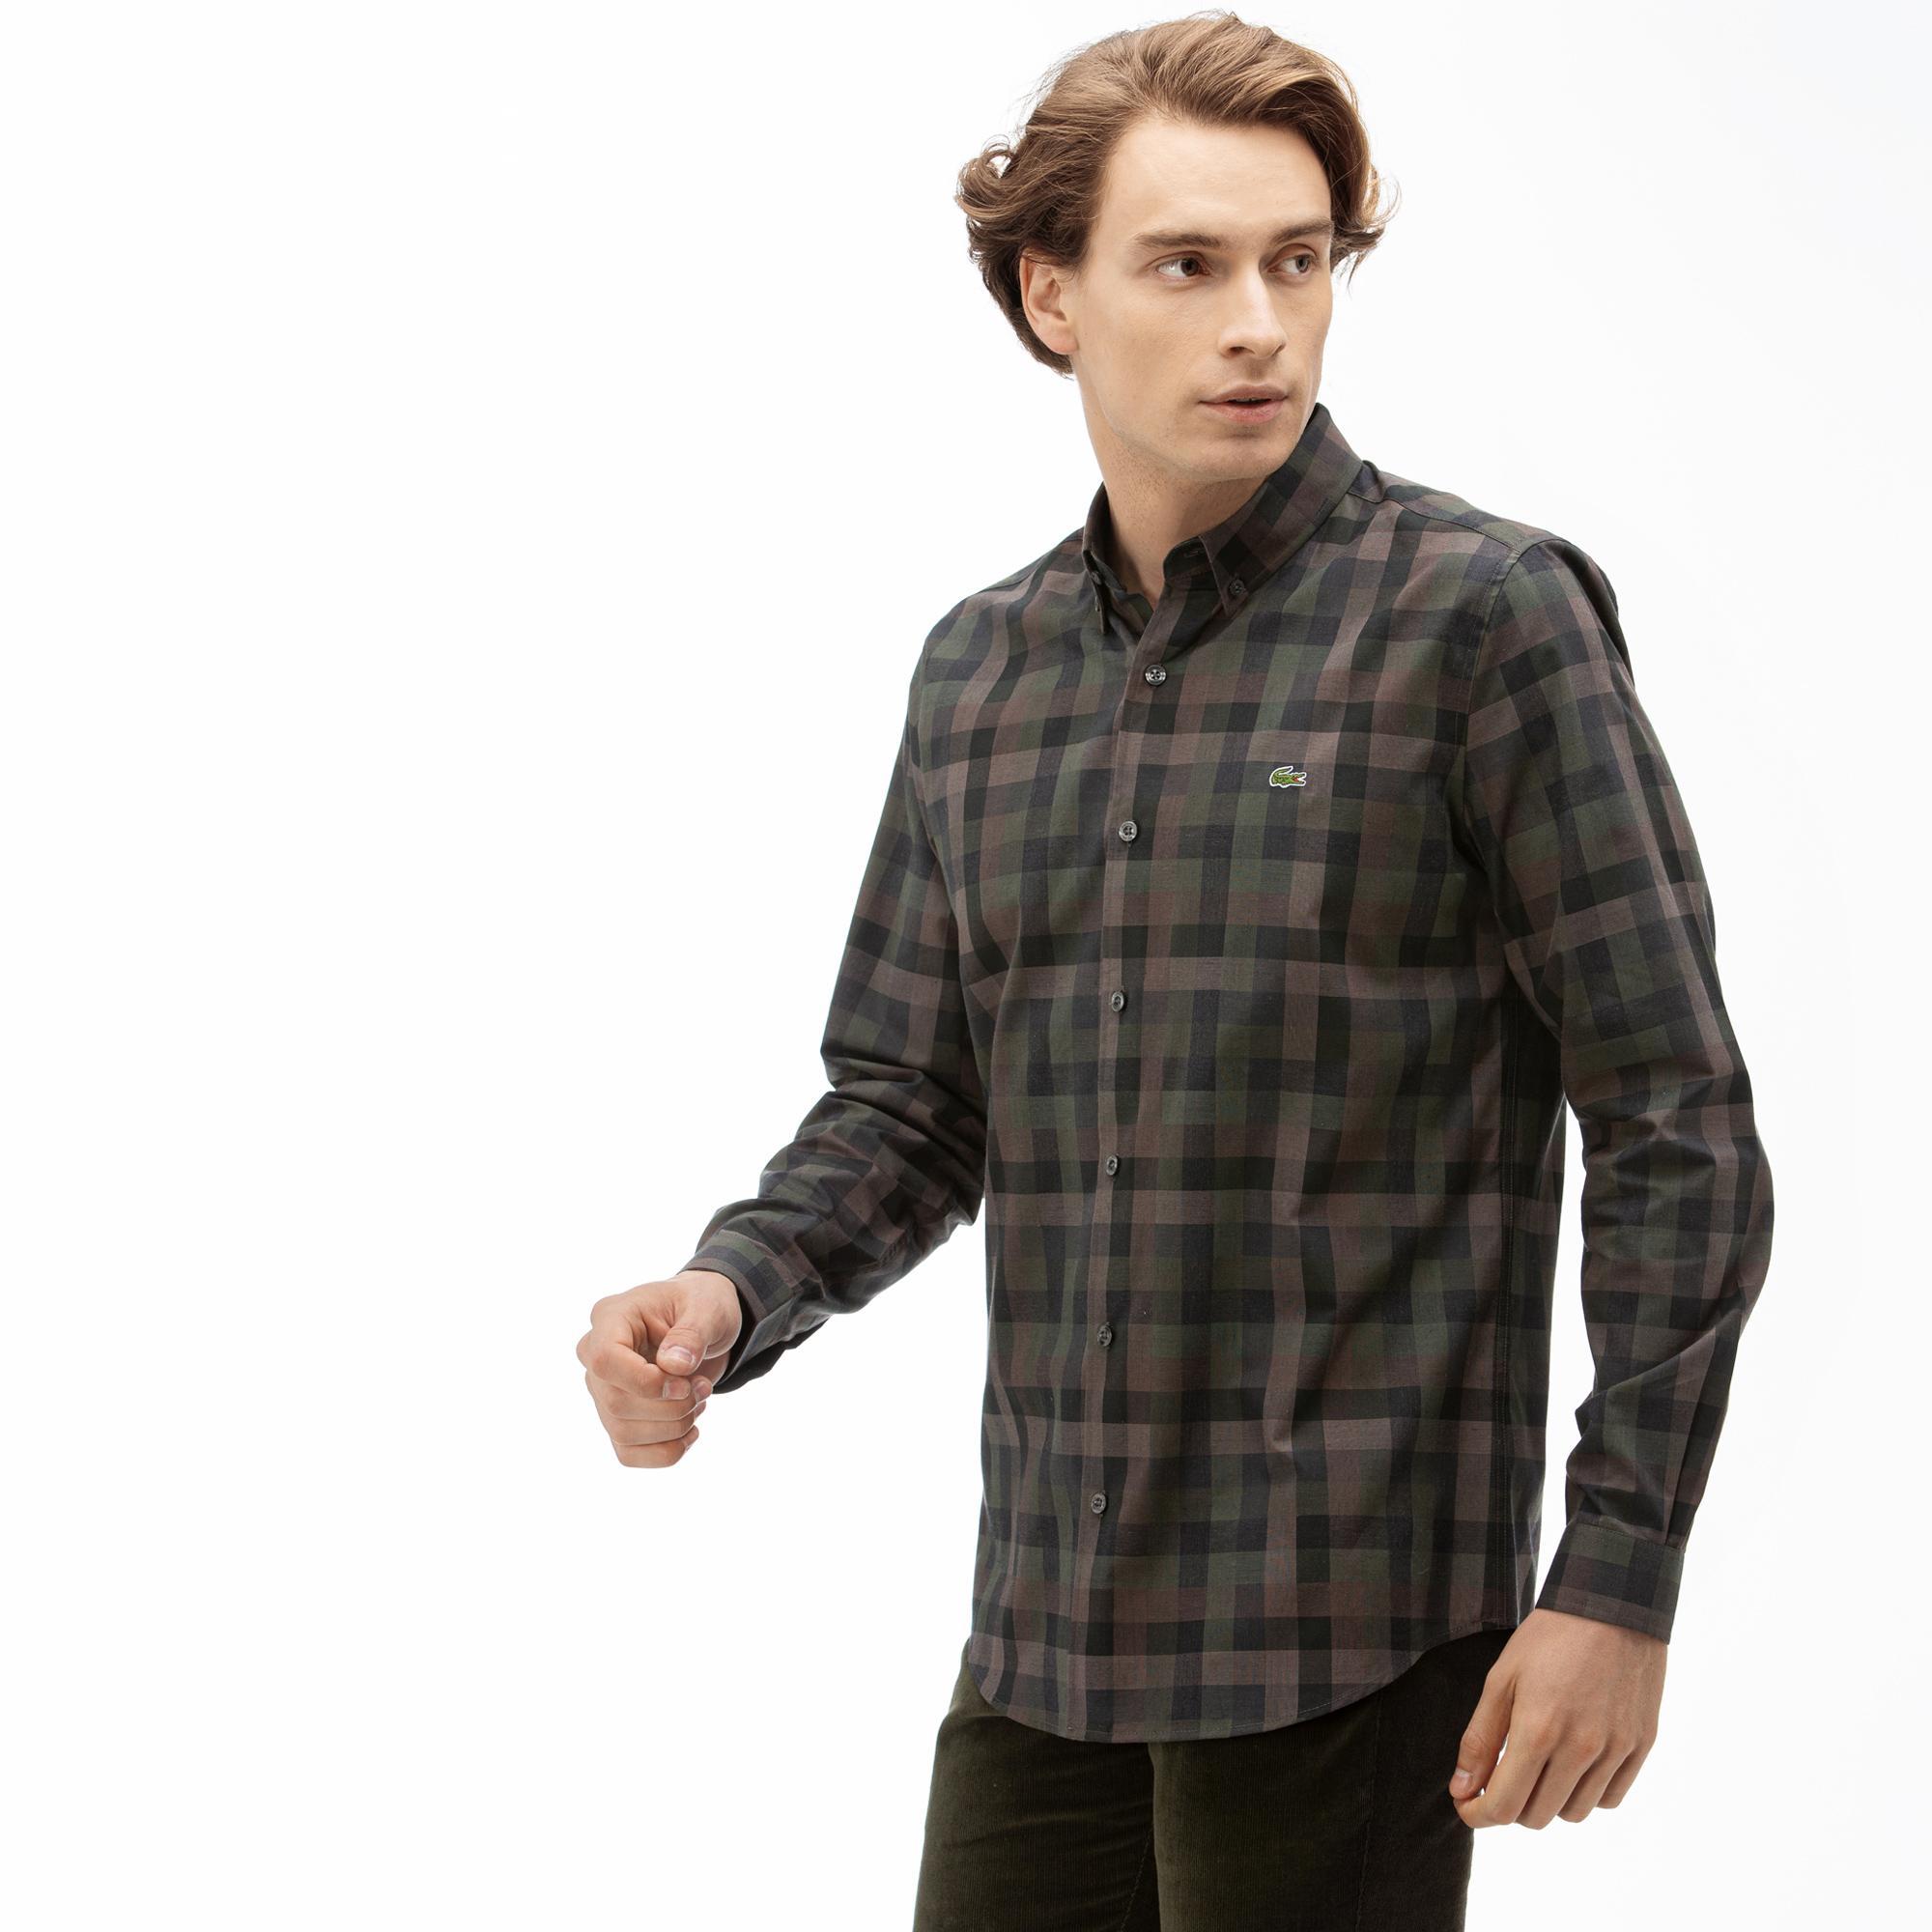 Lacoste Erkek Slim Fit Ekose Desenli Renkli Gömlek